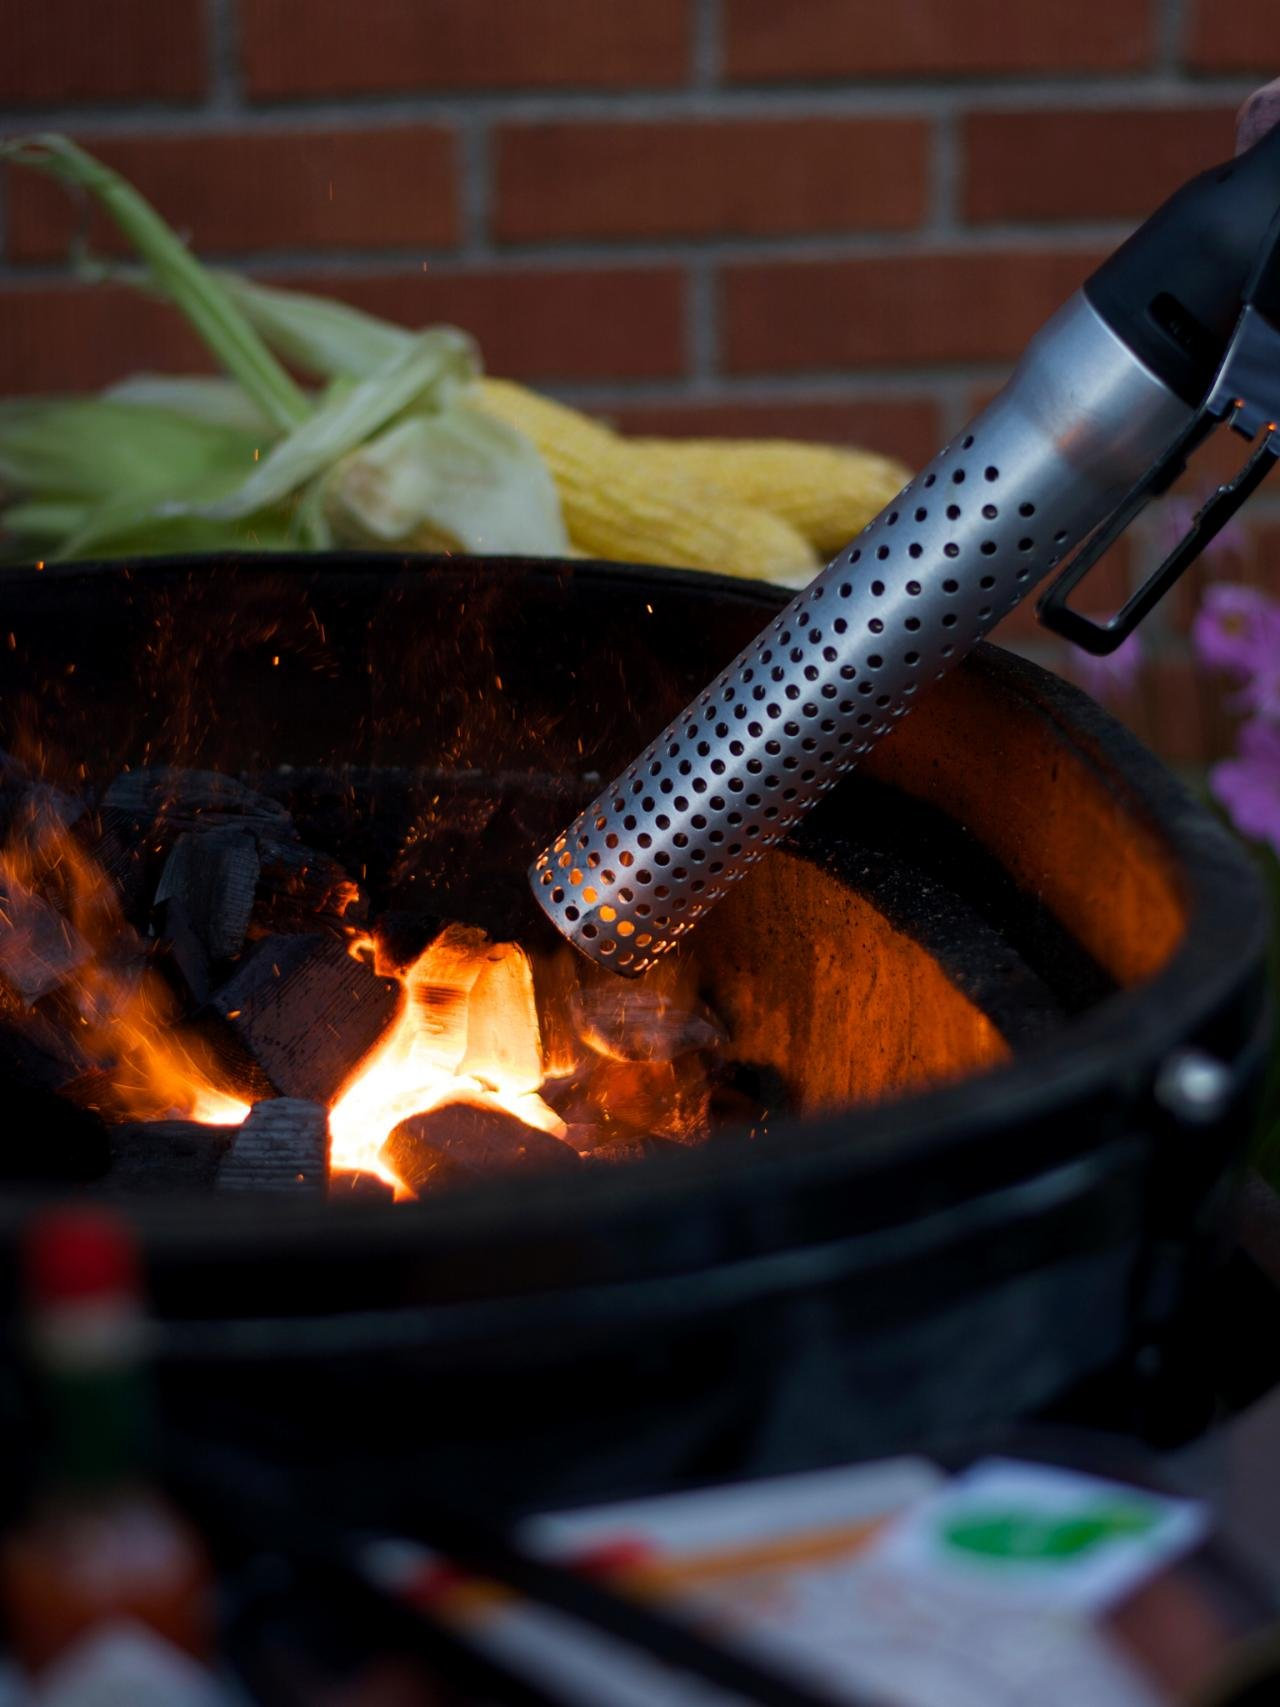 Looftlighter Fire Lighting Tool and Case